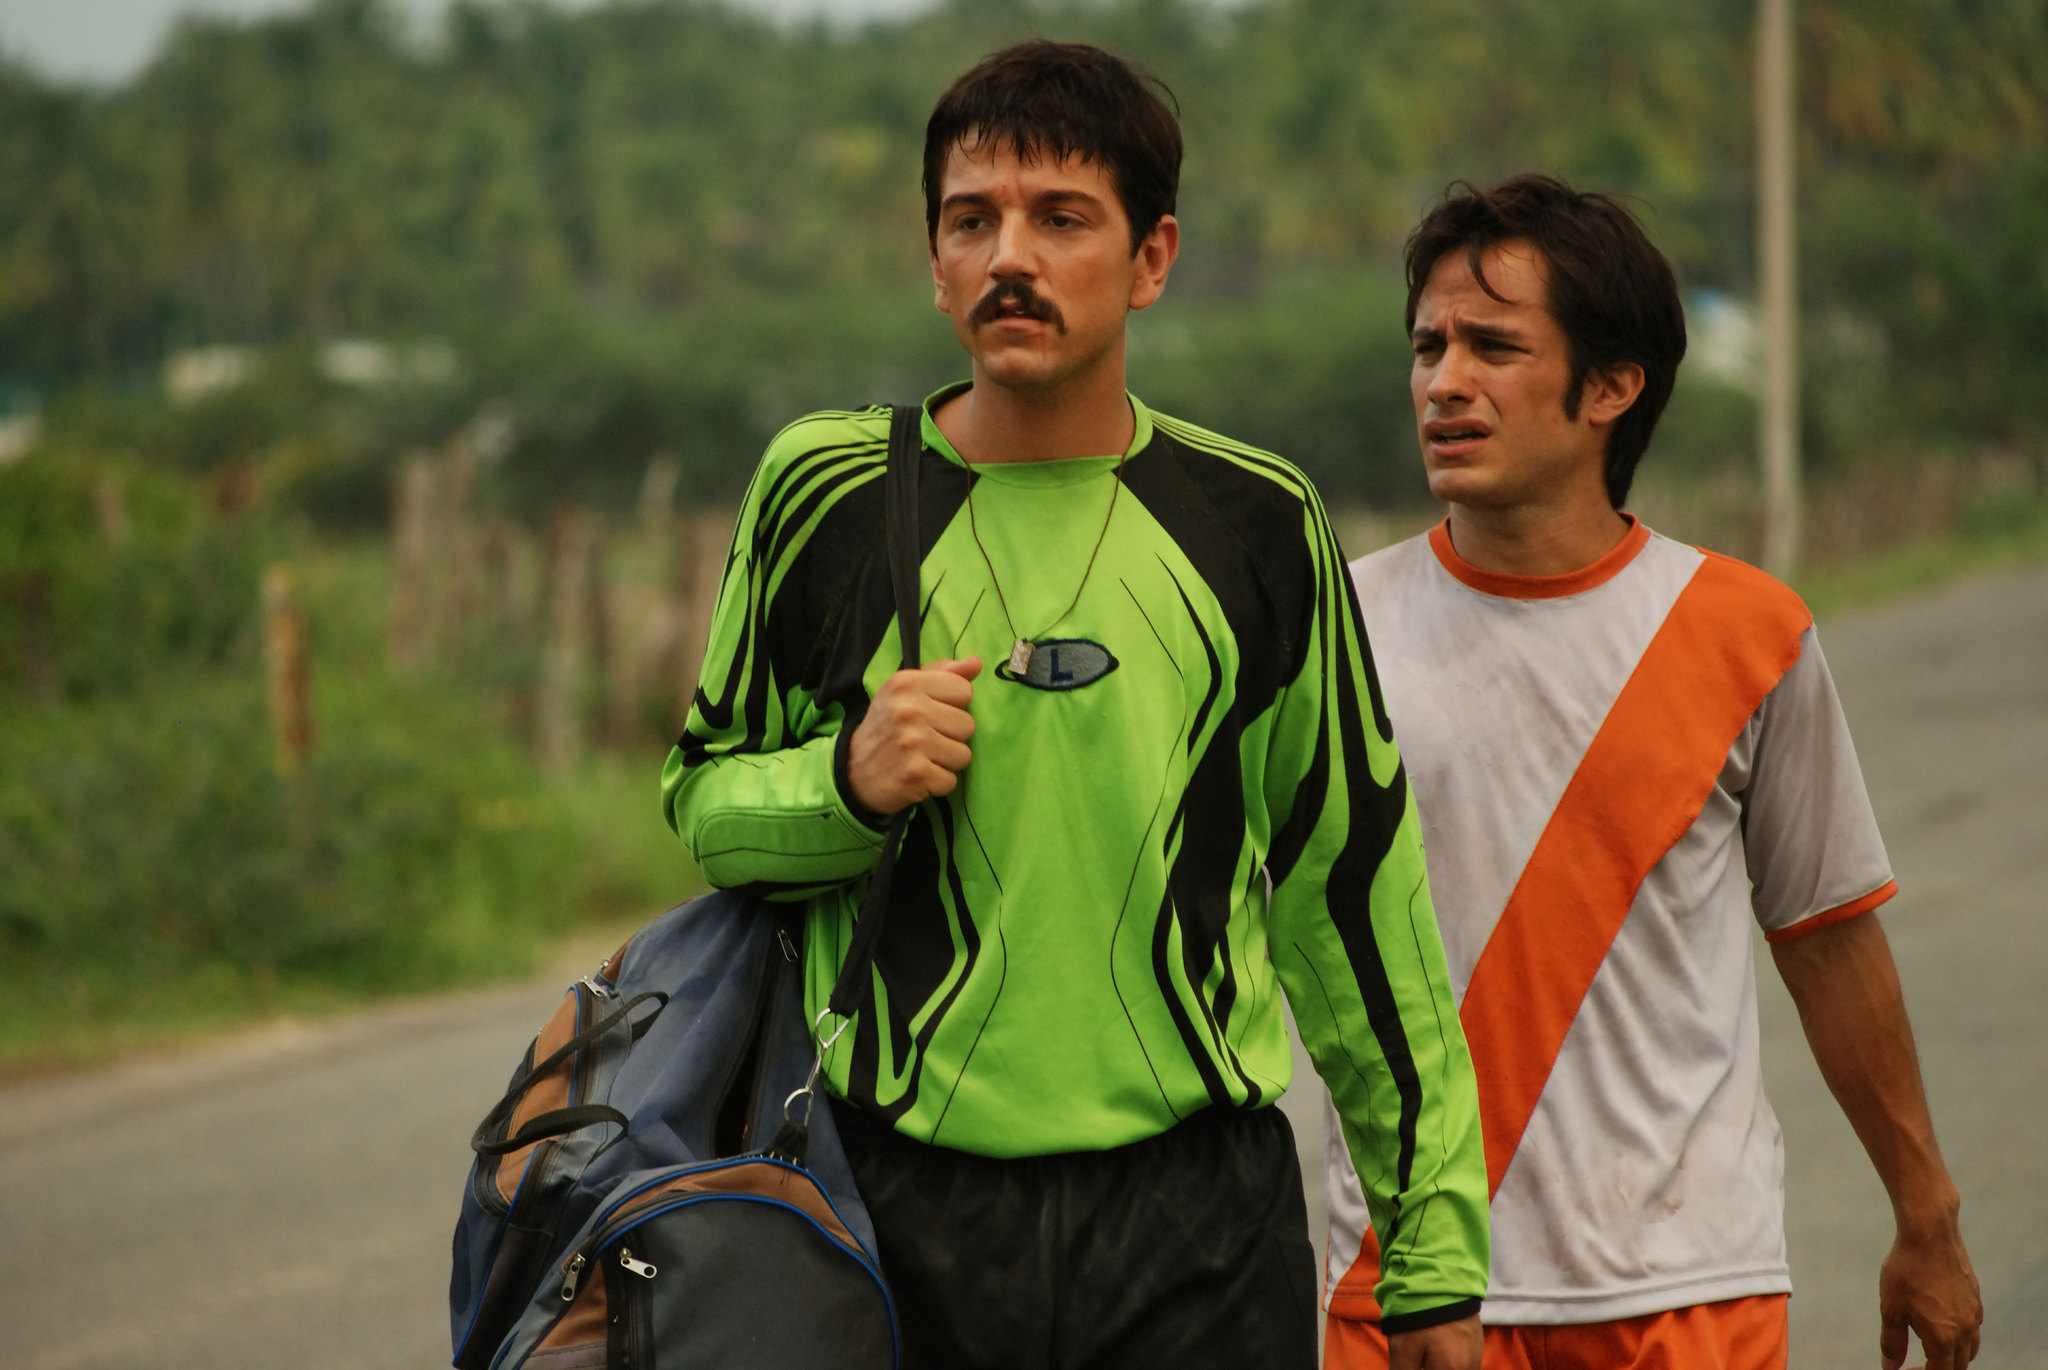 Still of Gael García Bernal and Diego Luna in Rudo y Cursi (2008)